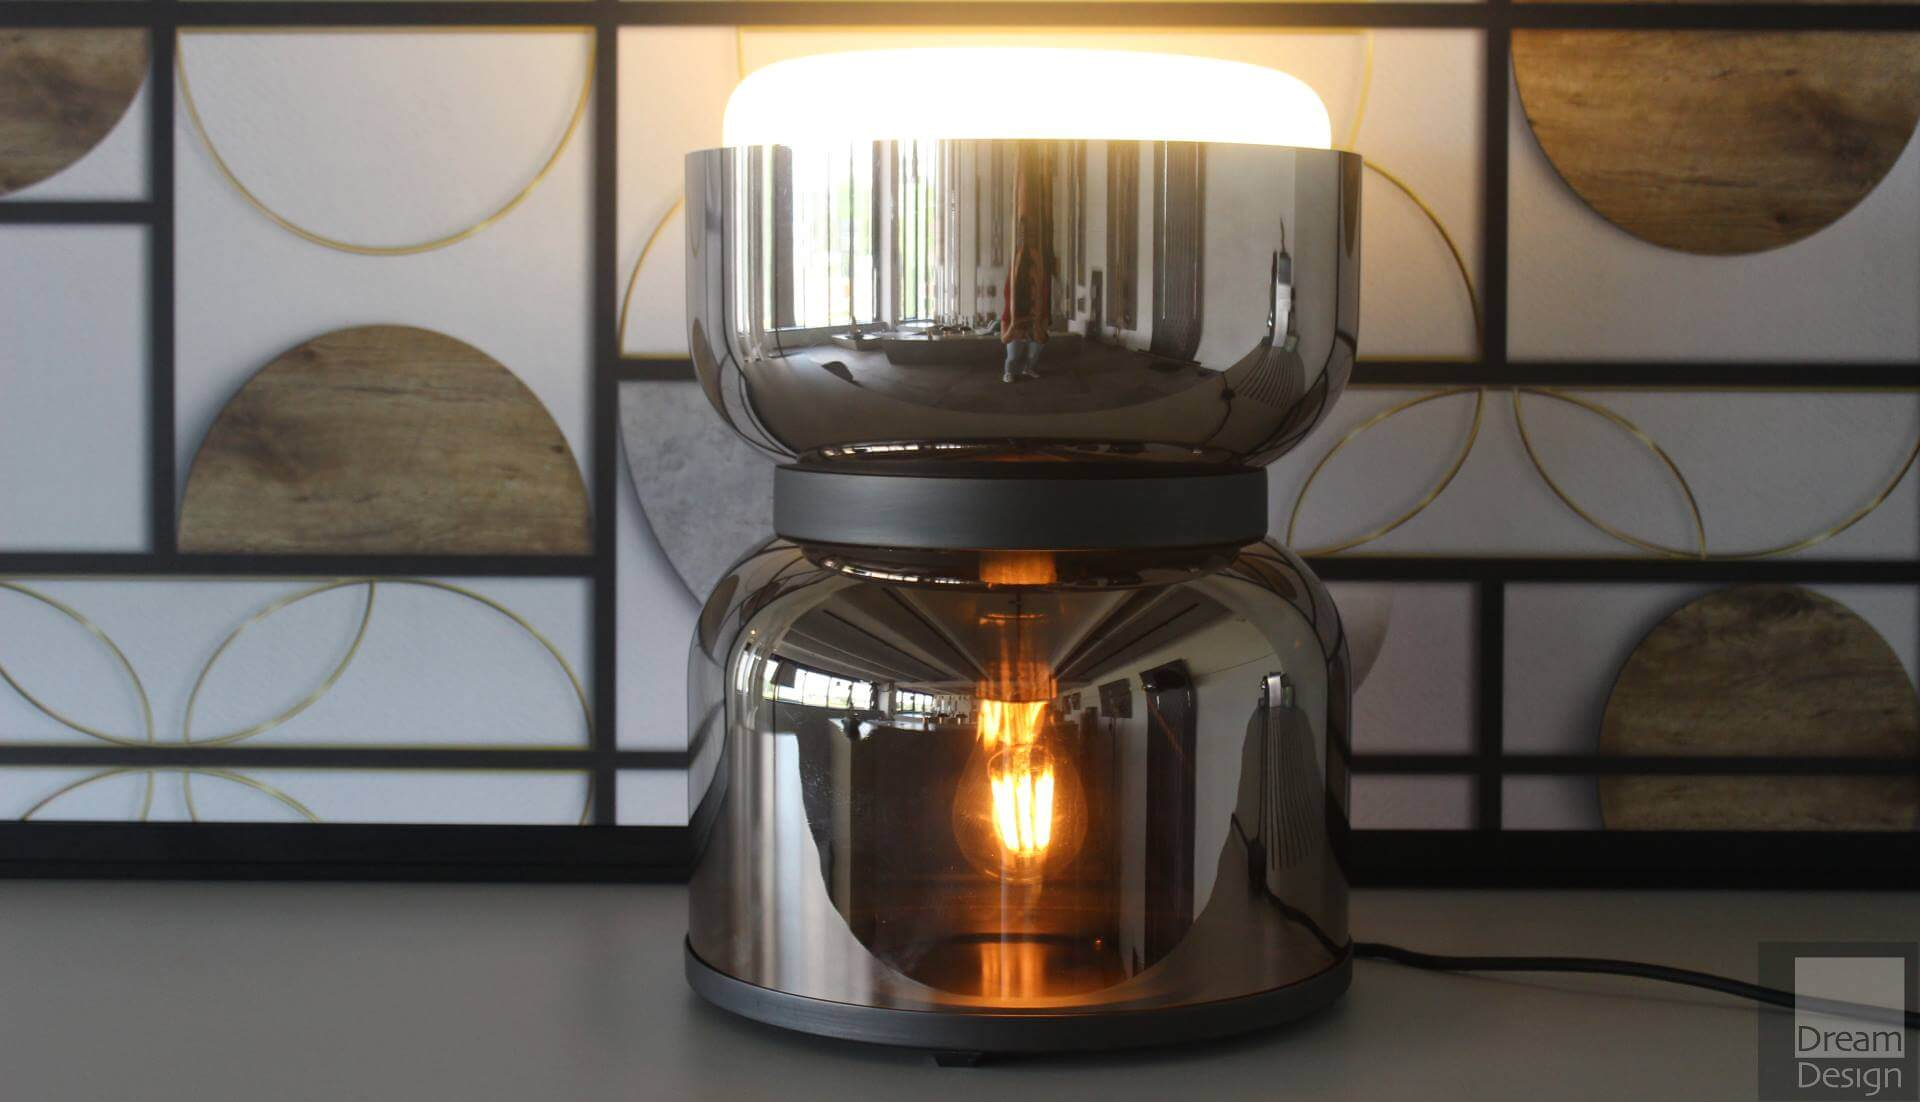 Contardi Clessidra Kronos Light